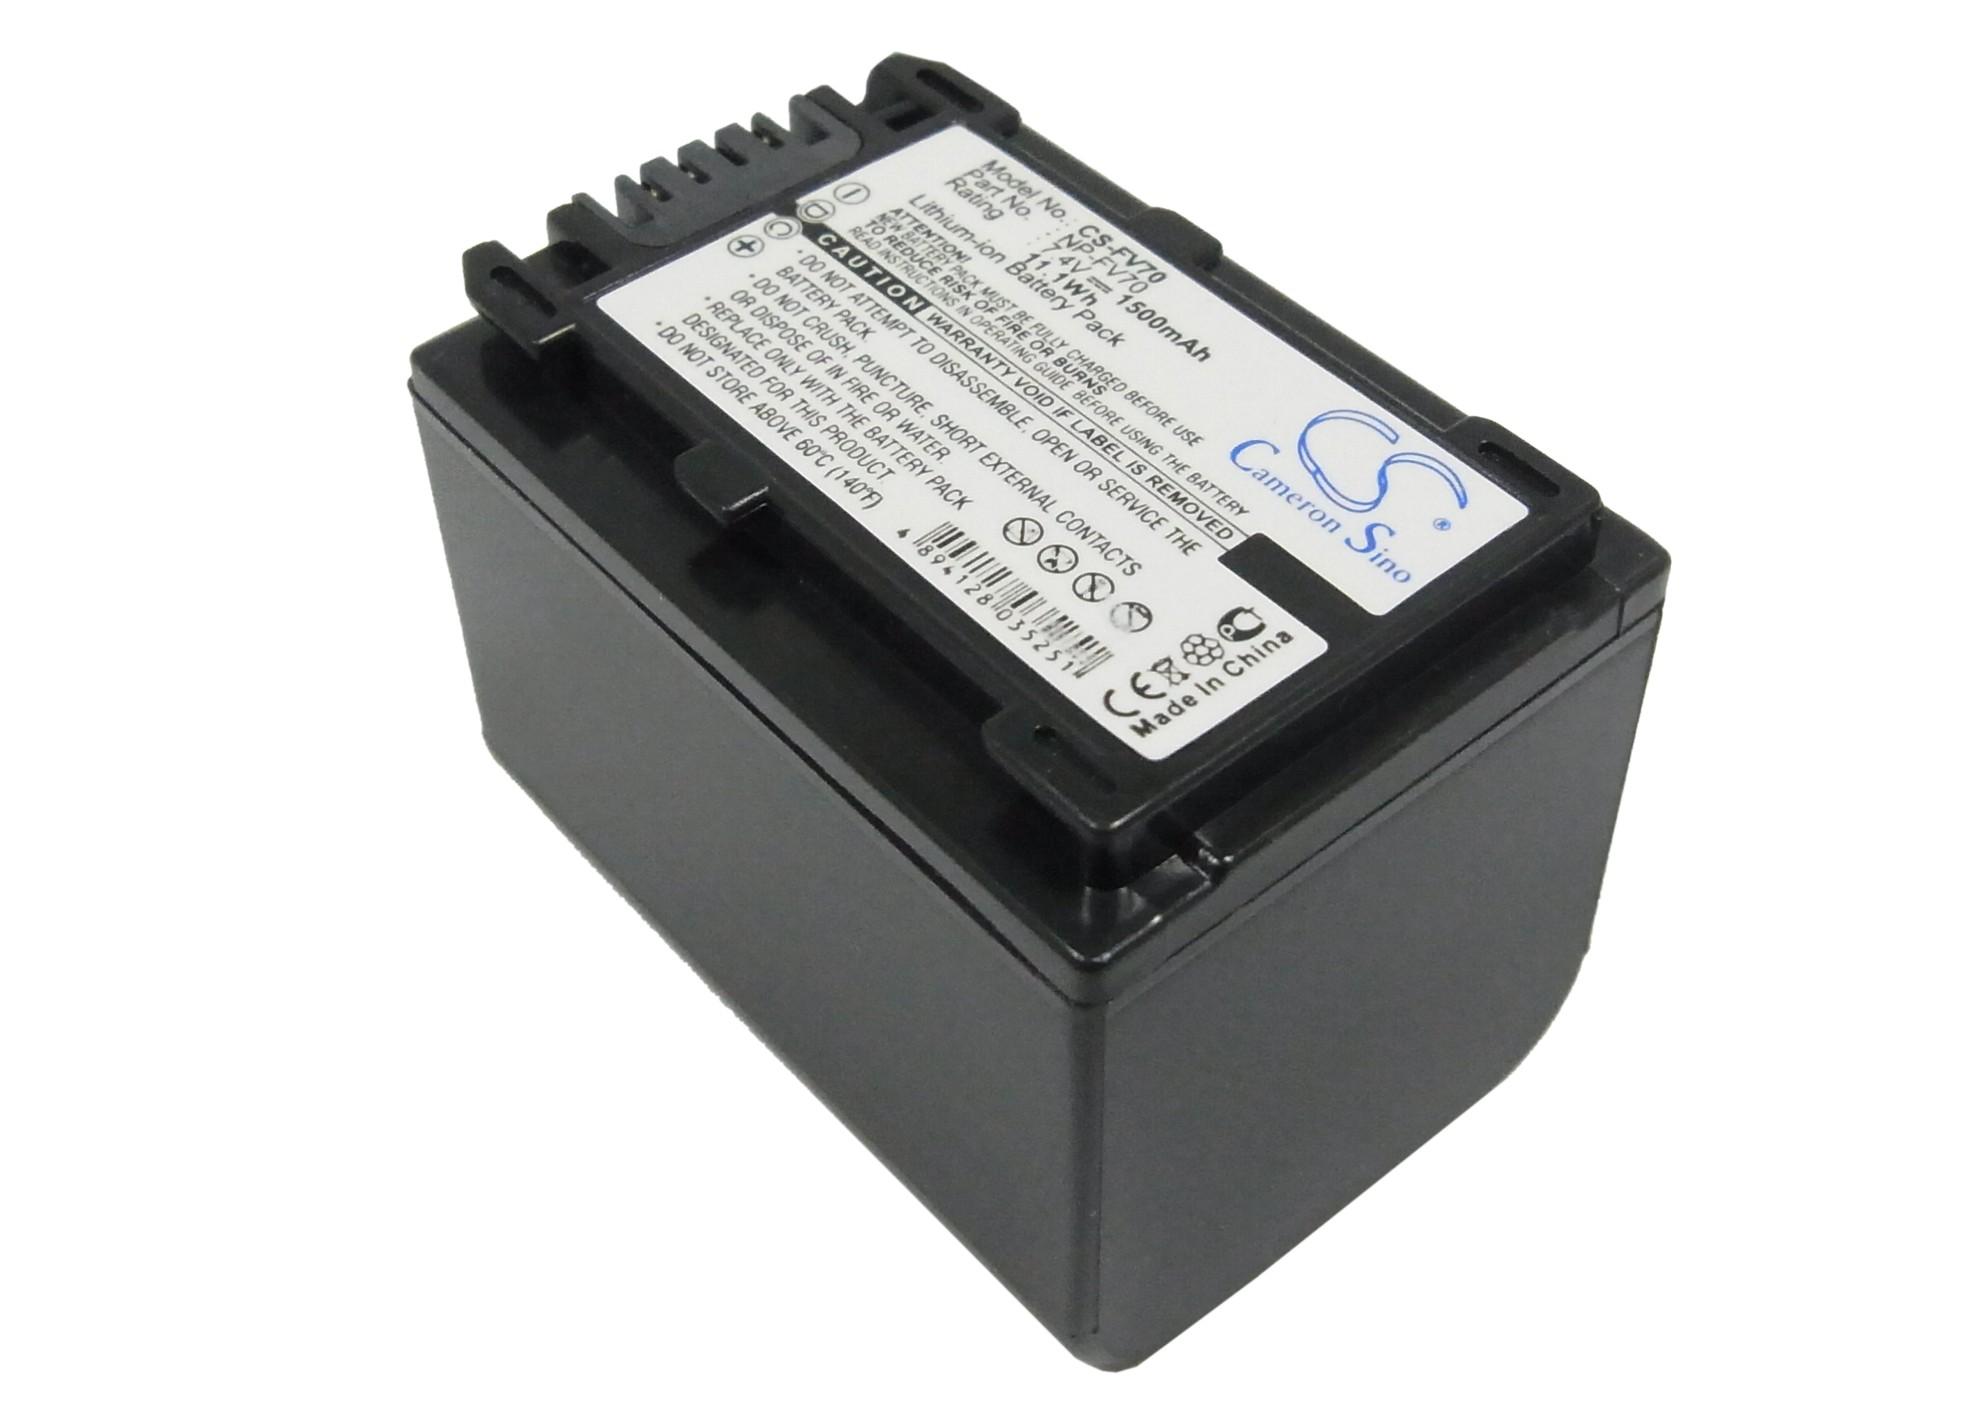 Cameron Sino baterie do kamer a fotoaparátů pro SONY DCR-SX34E 7.4V Li-ion 1500mAh černá - neoriginální